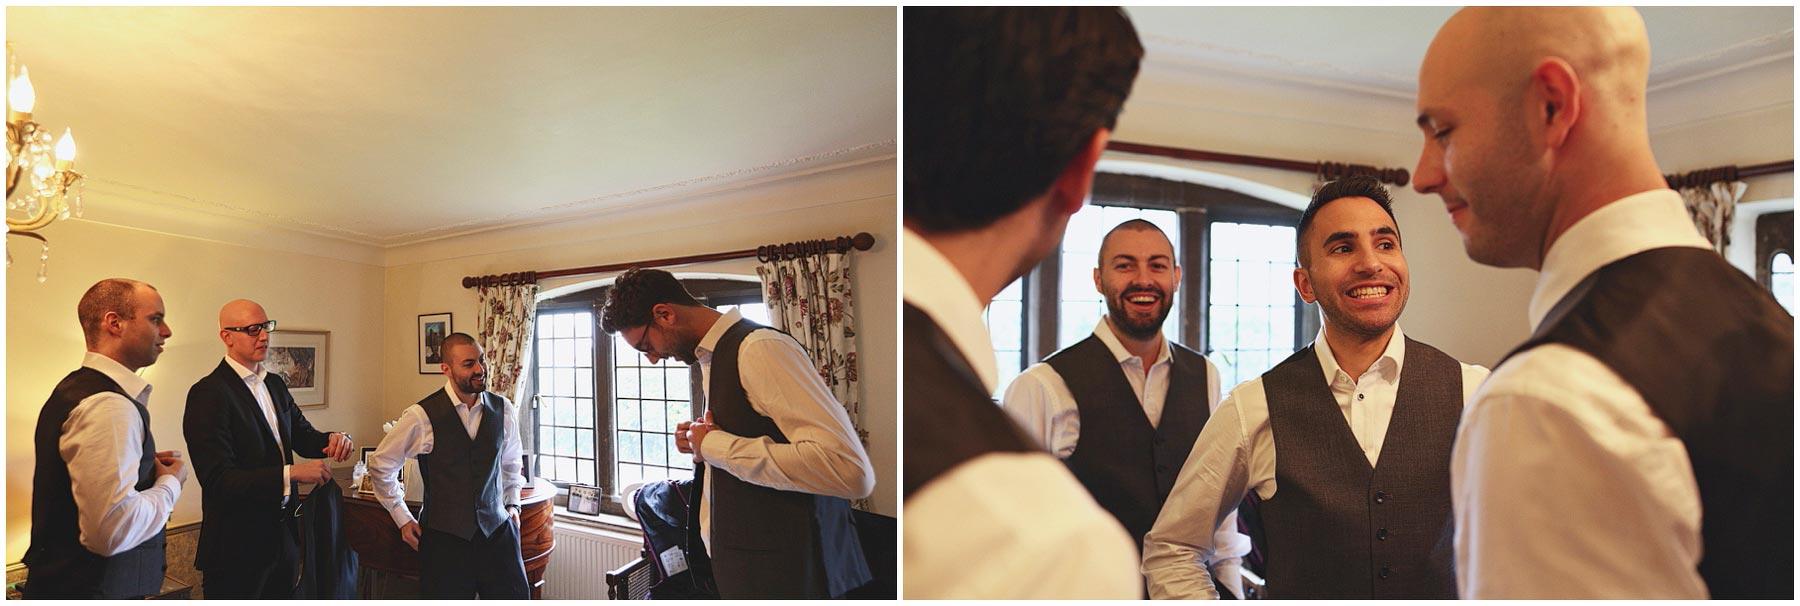 Jewish-Wedding-Photography_0021